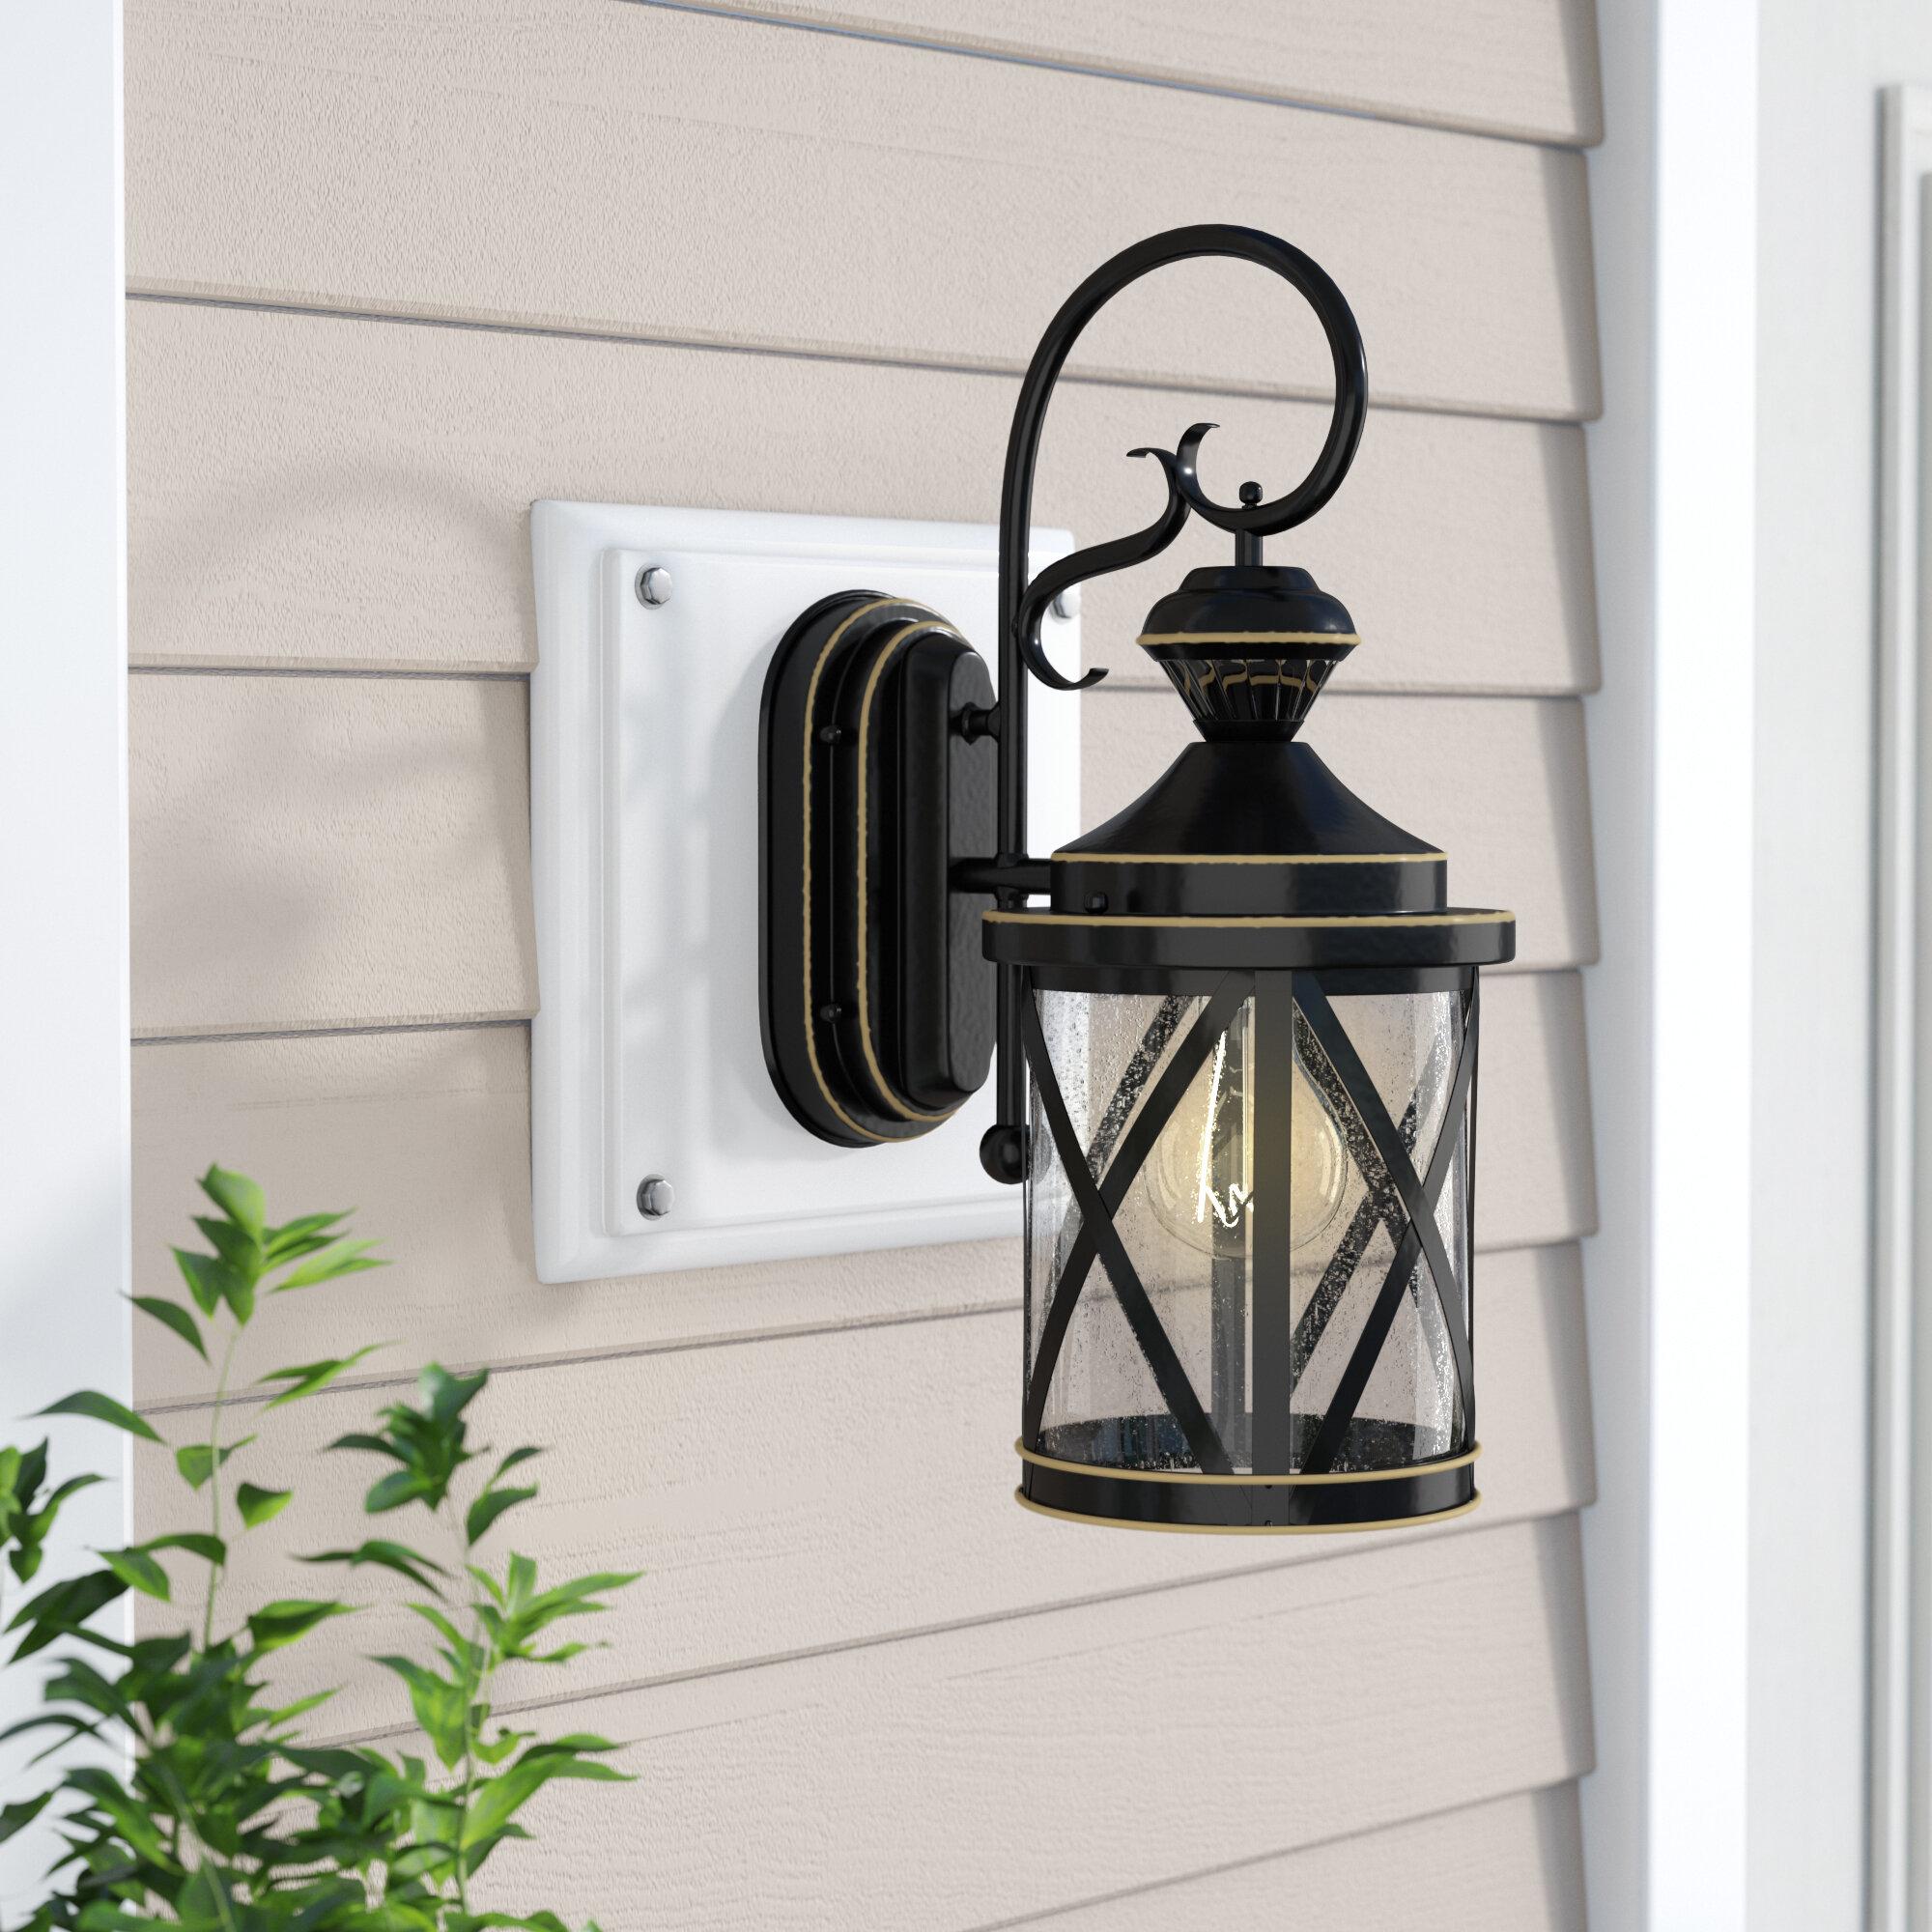 Charlton Home Vidrio Black Gold Outdoor Wall Lantern With Motion Sensor Reviews Wayfair